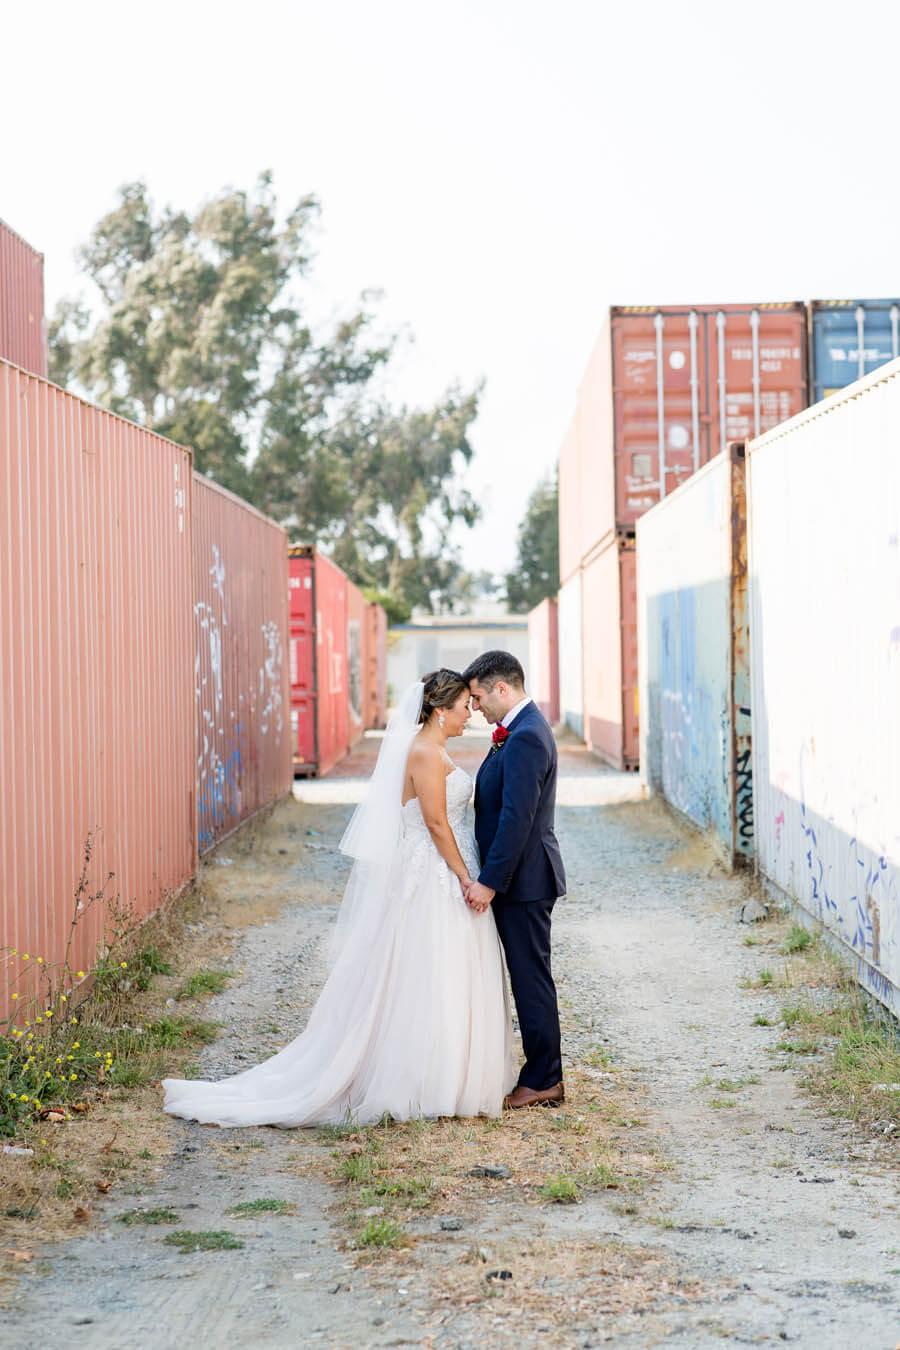 Bride and groom at Treasure Island shipyard by The Winery SF